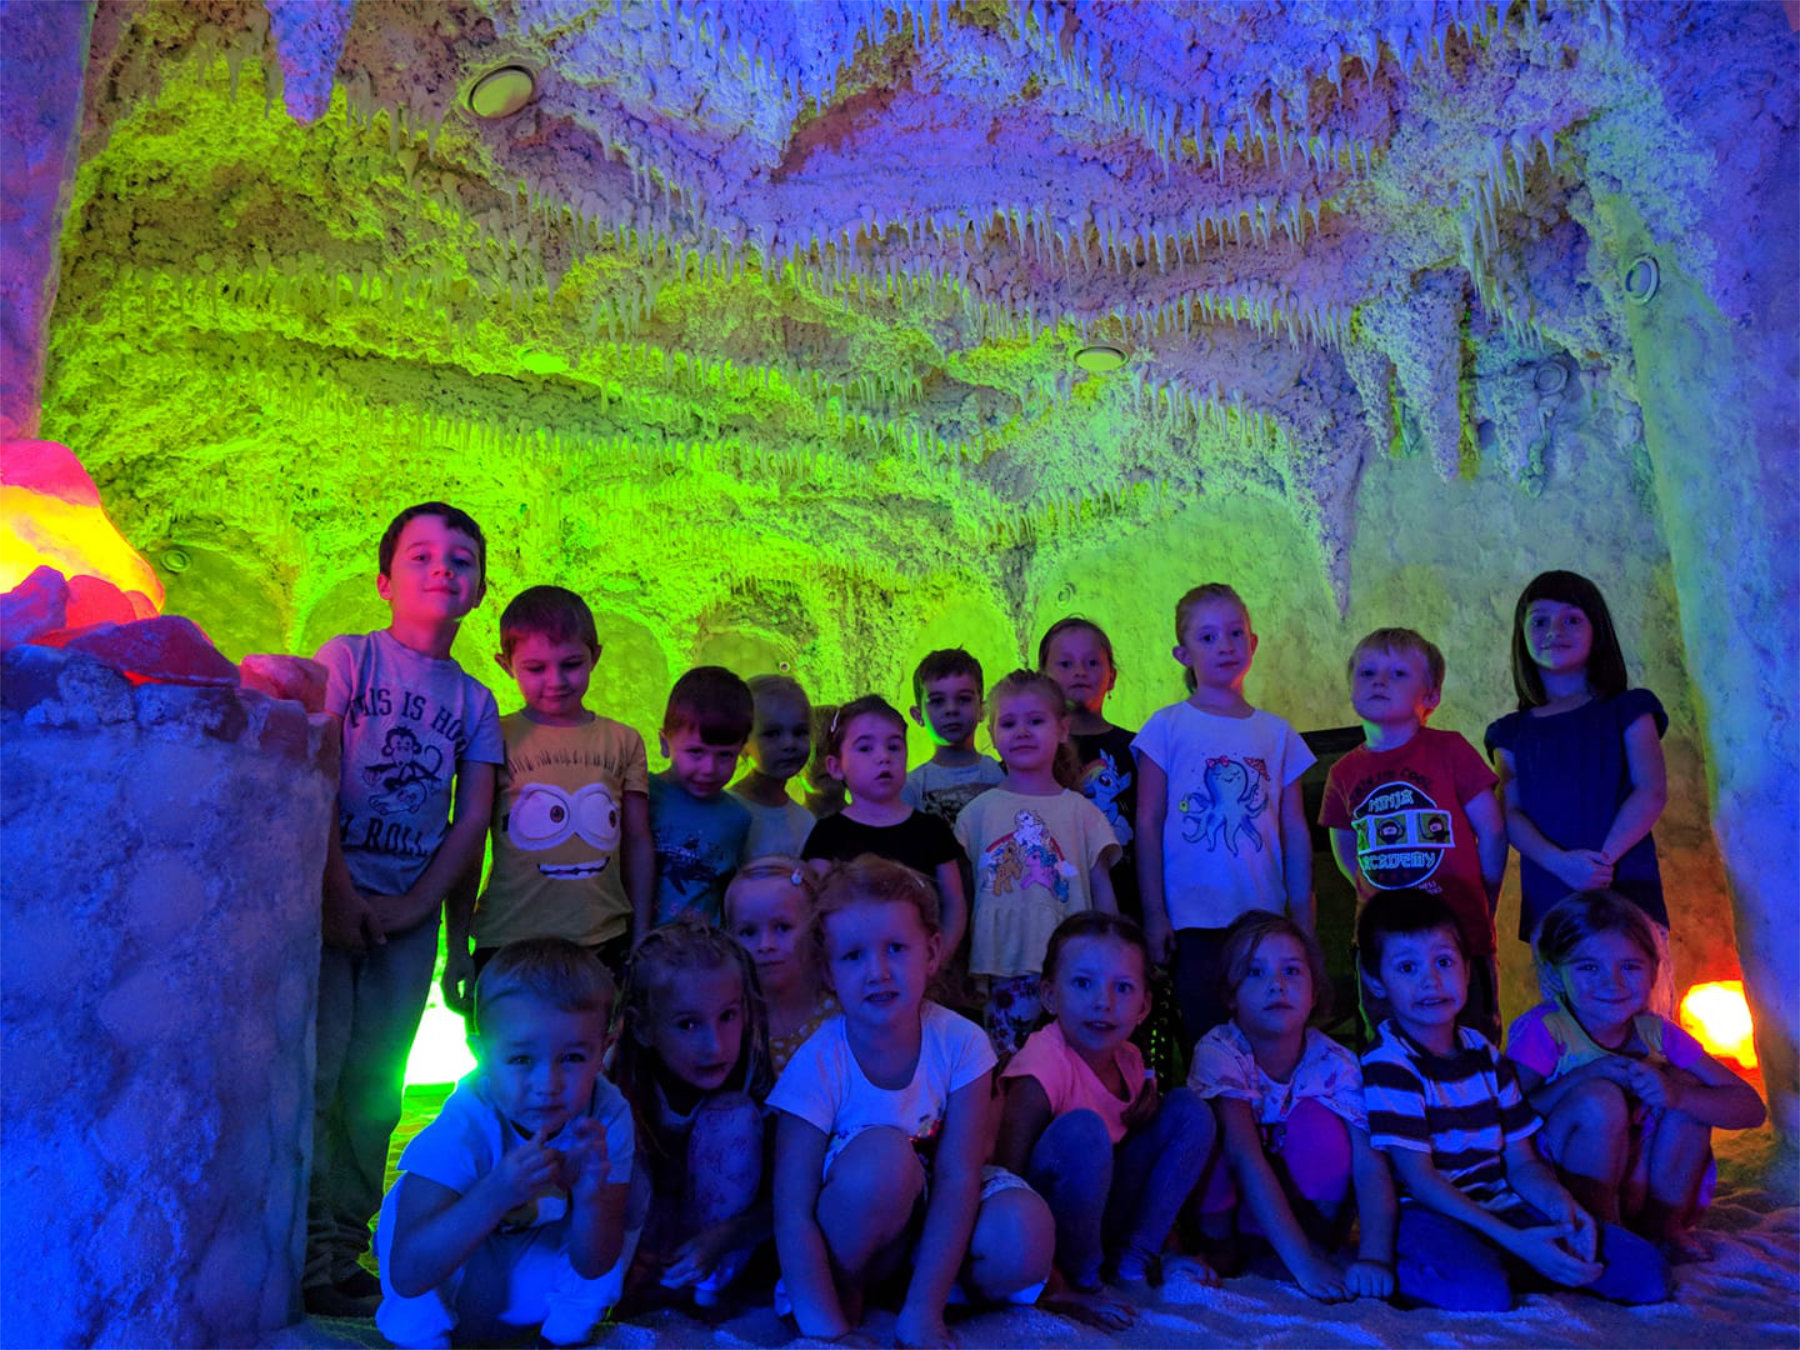 Univerzitka - materska skolka Brno - solna jeskyne